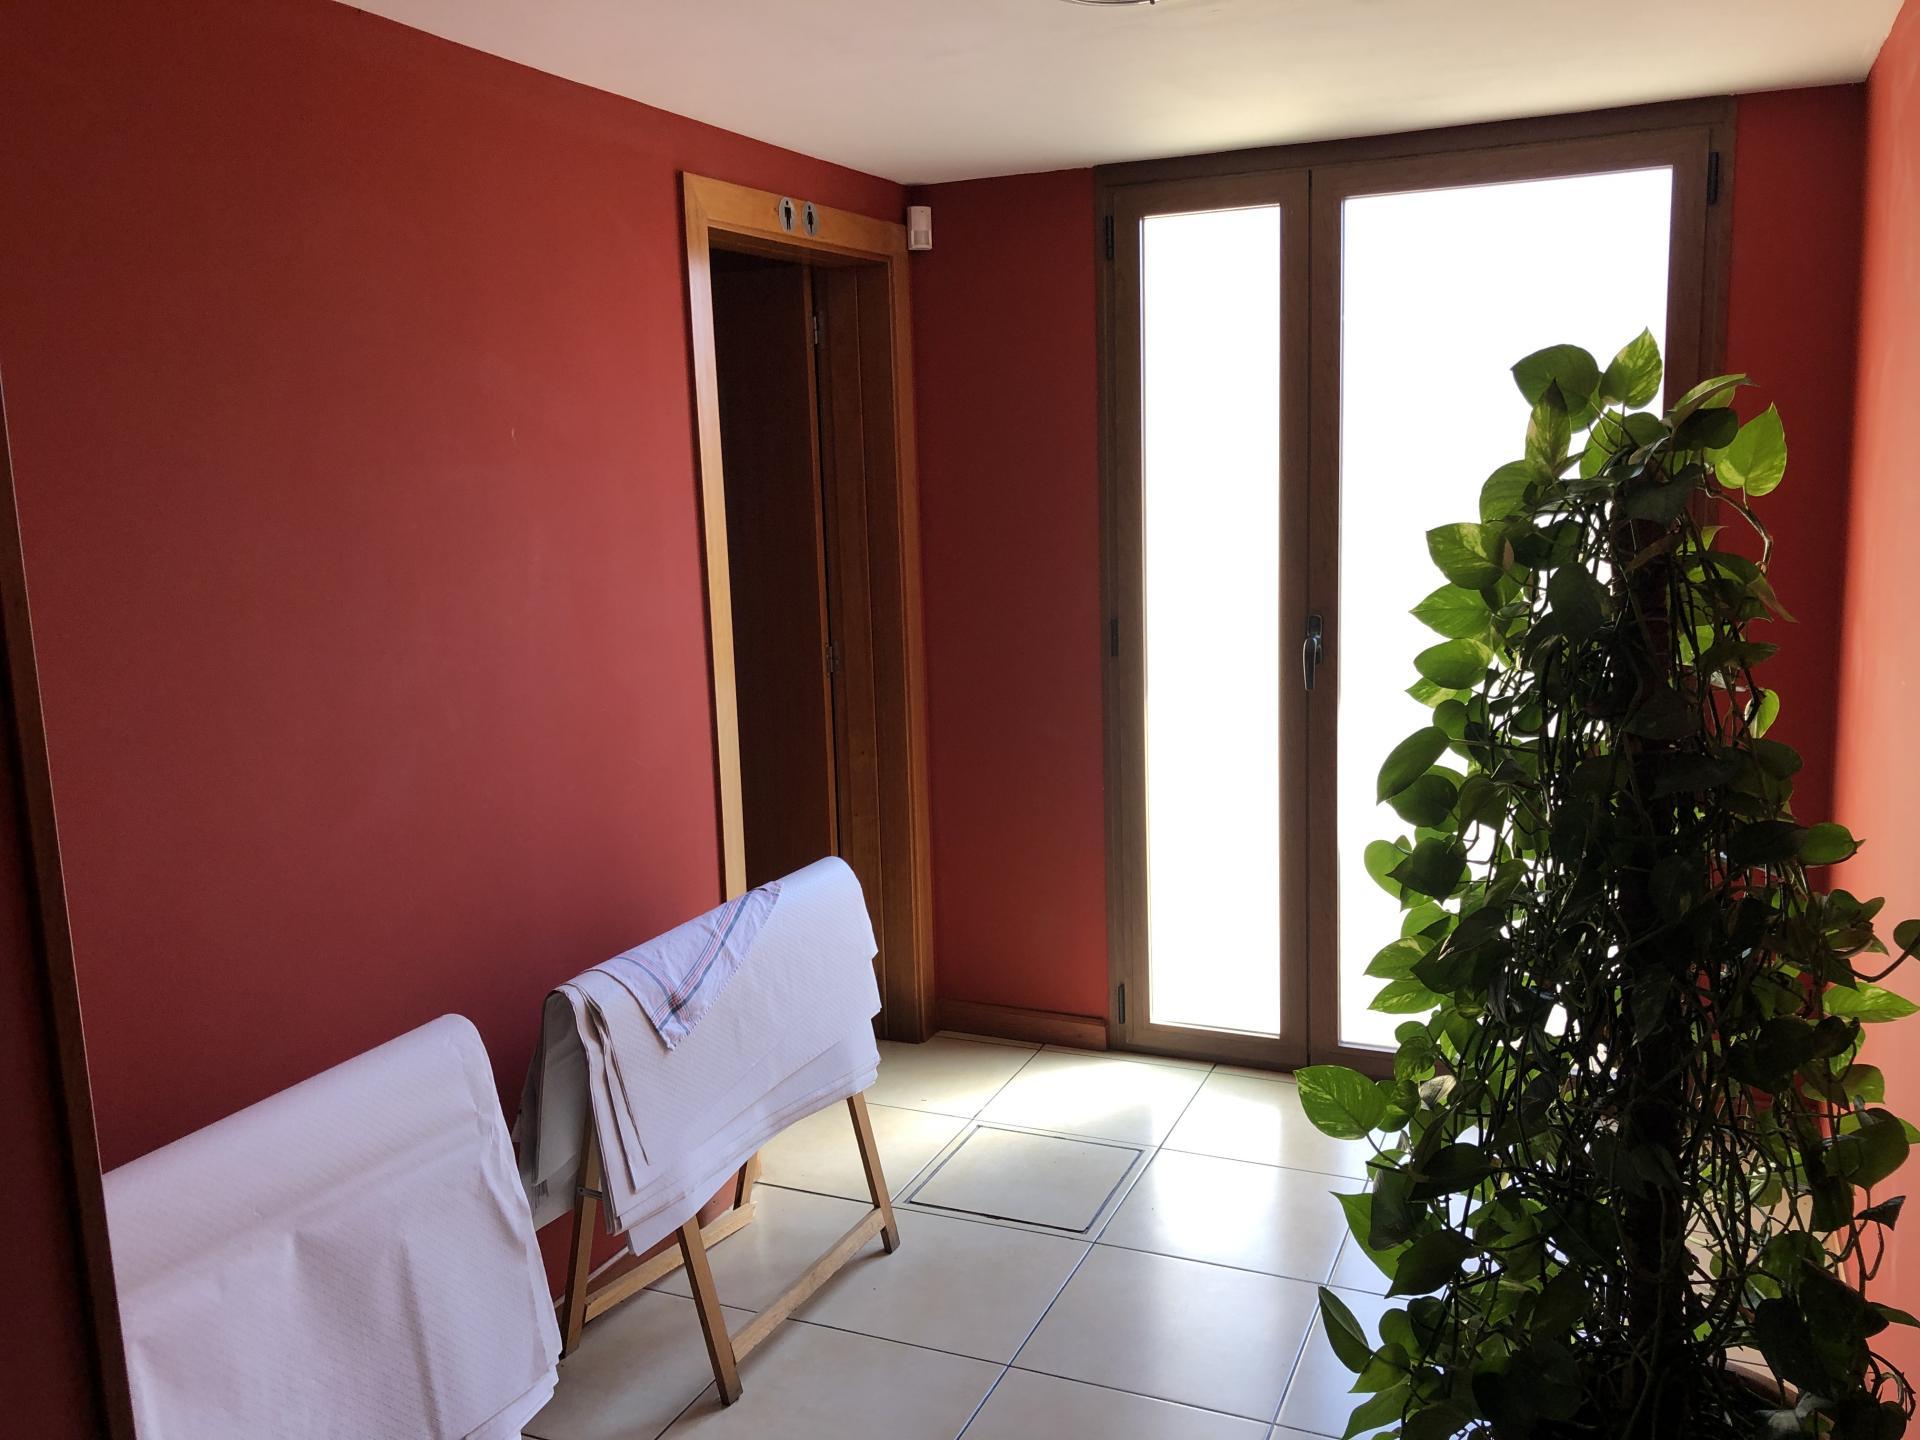 Foto 15 (V-735-2021) - Inmueble en  Venda a Santa Margarida i els Monjos